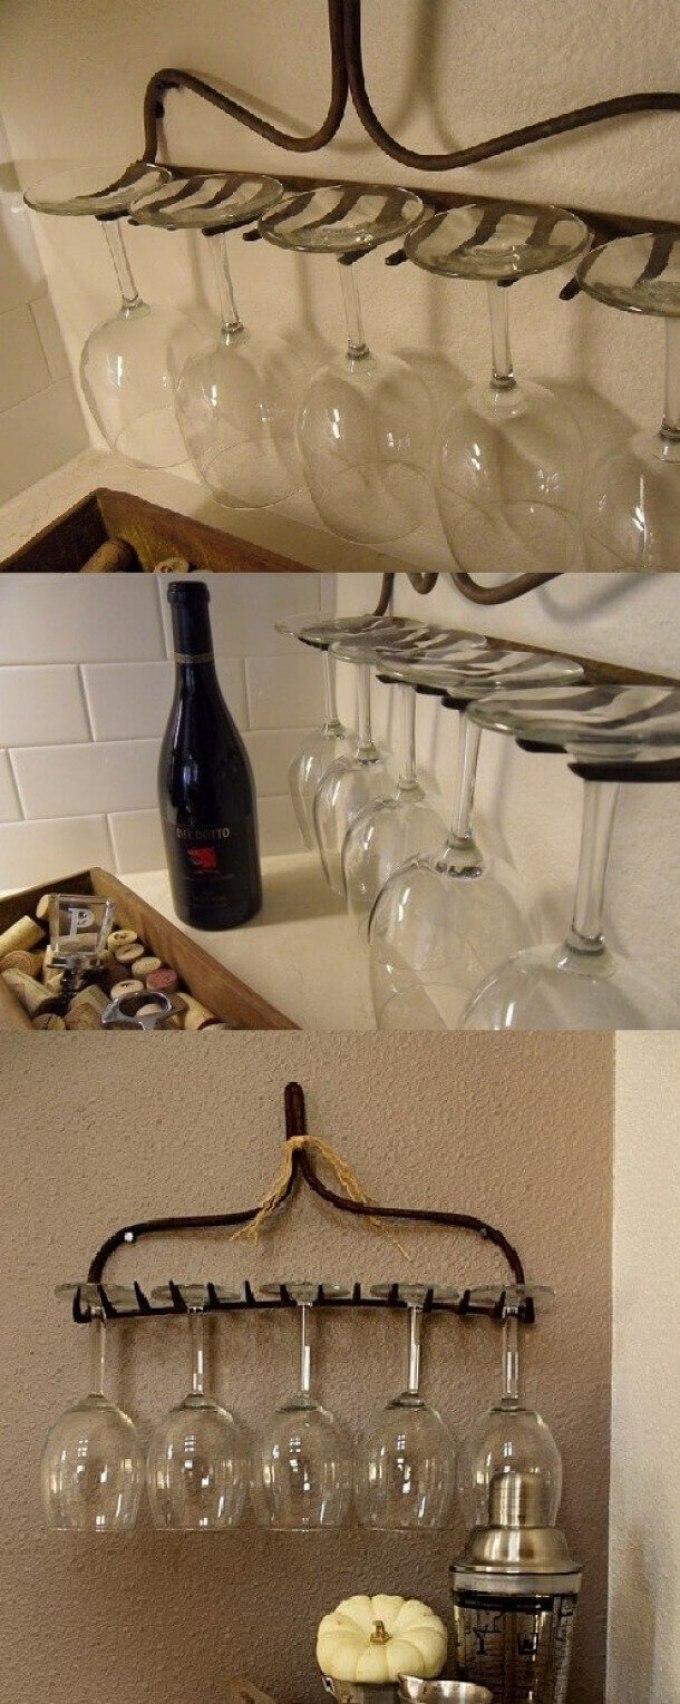 Farmhouse Kitchen Decor Design Ideas - Salvaged Antique Rake Wineglass Holder - harpmagazine.com